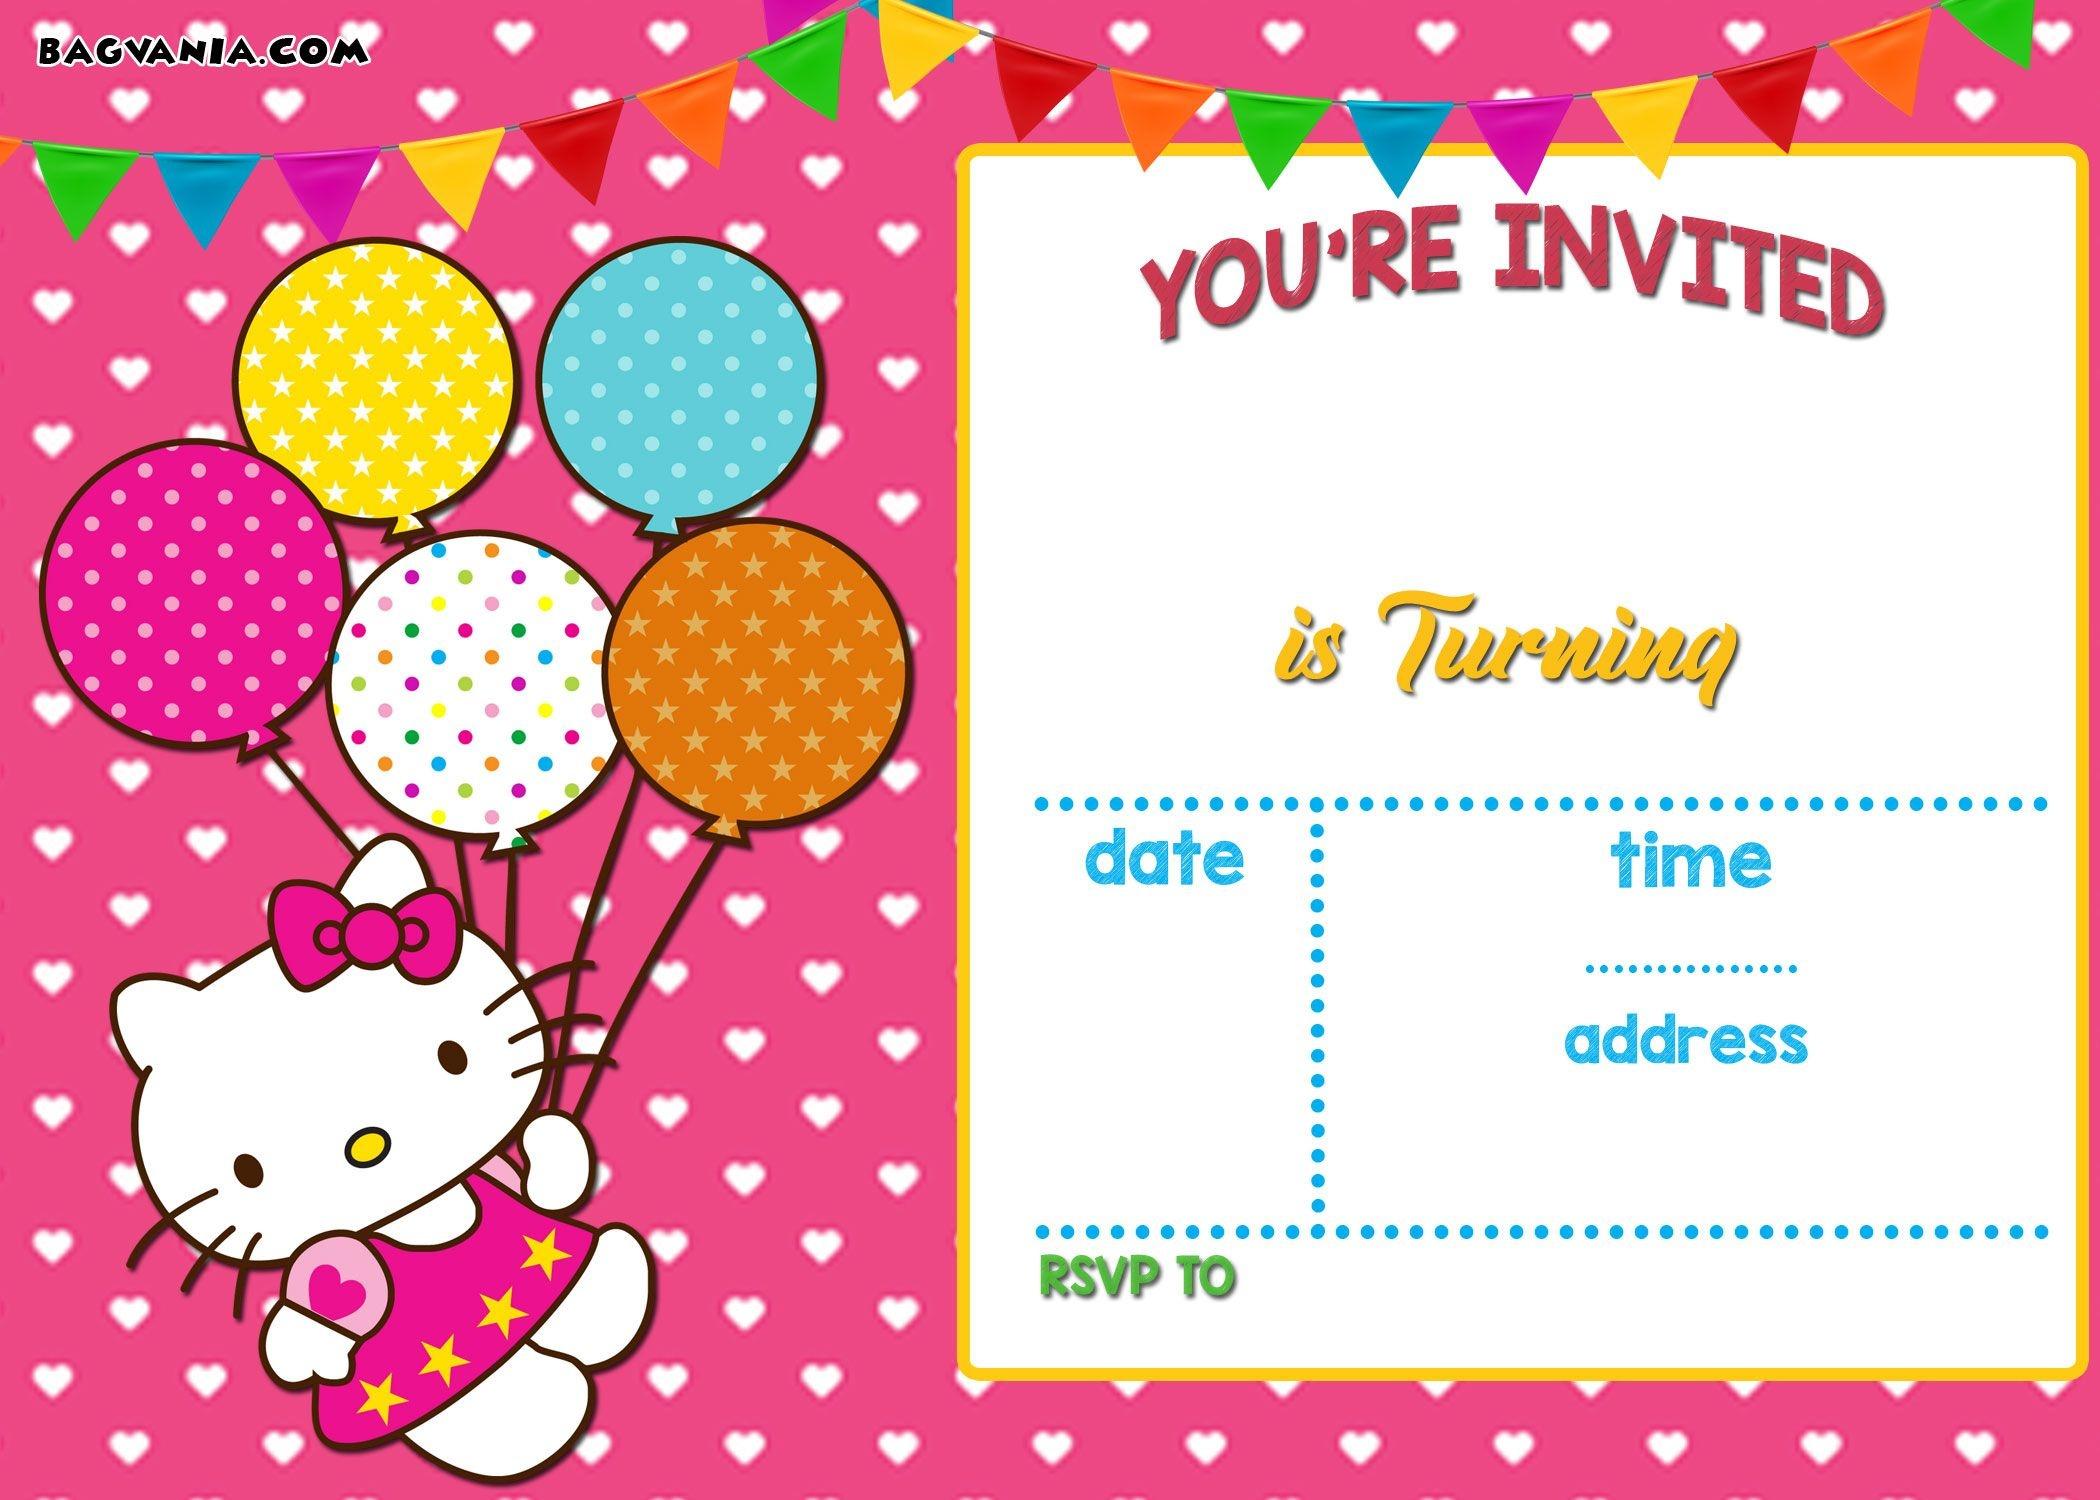 Personalized Hello Kitty Birthday Invitations - | Ayeza's 7Th - Hello Kitty Free Printable Invitations For Birthday